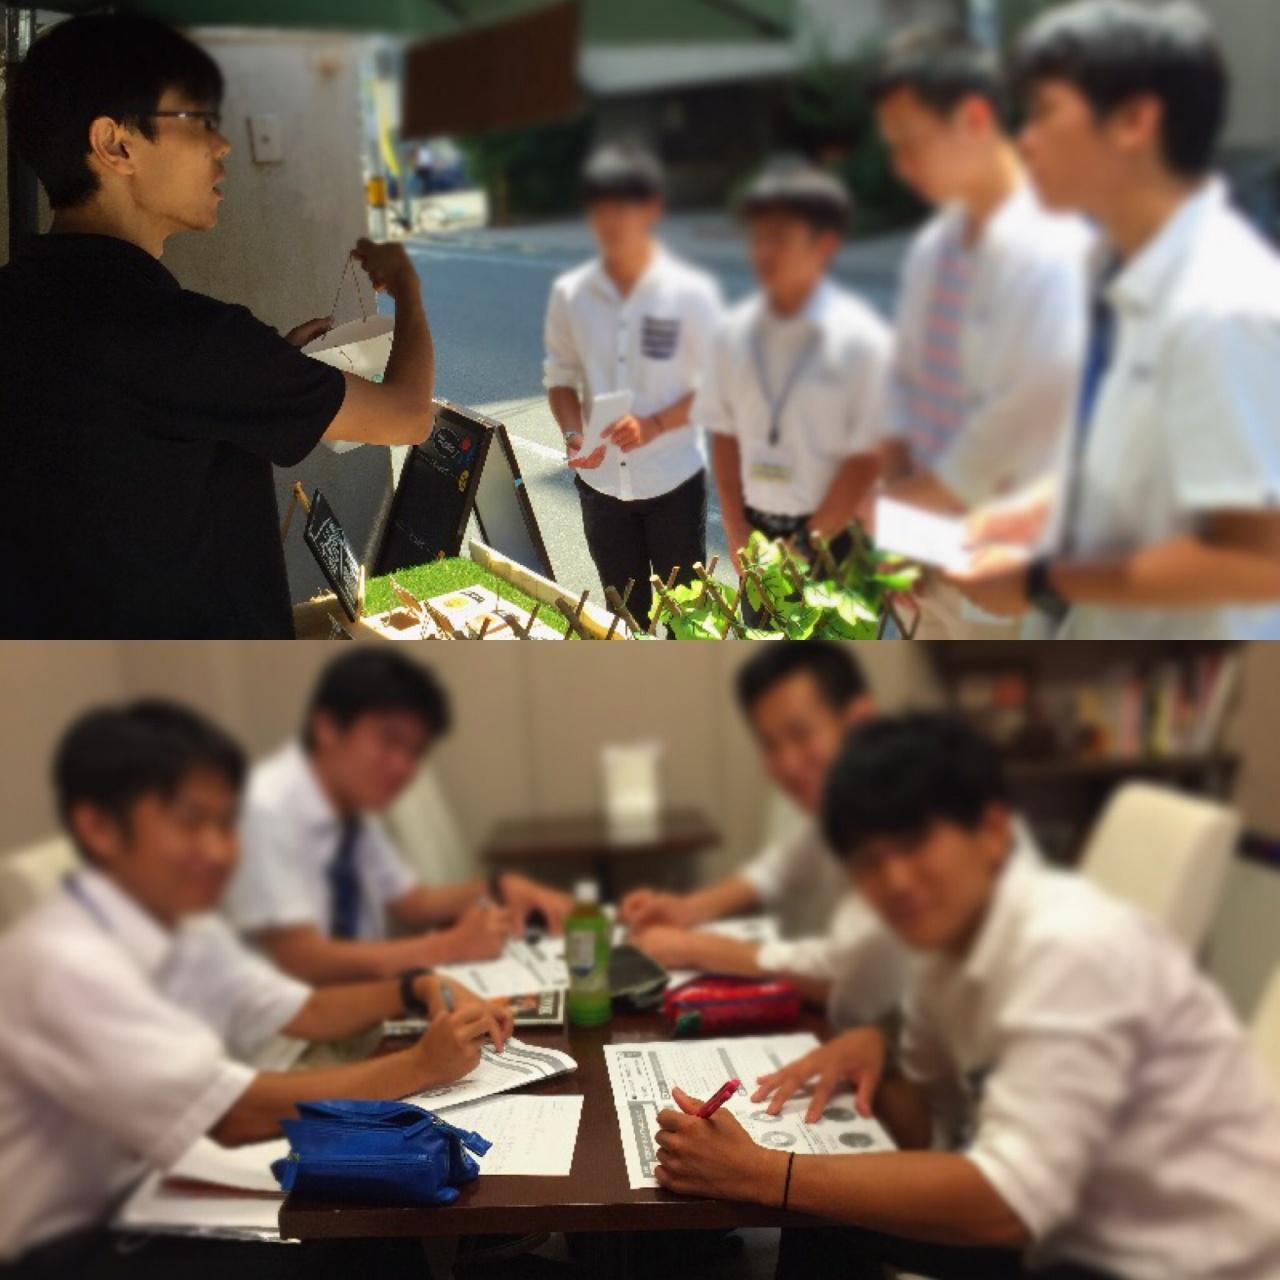 GIVE&GIFT(ギブアンドギフト):大阪経済法科大学のインターンシップを受け入れました